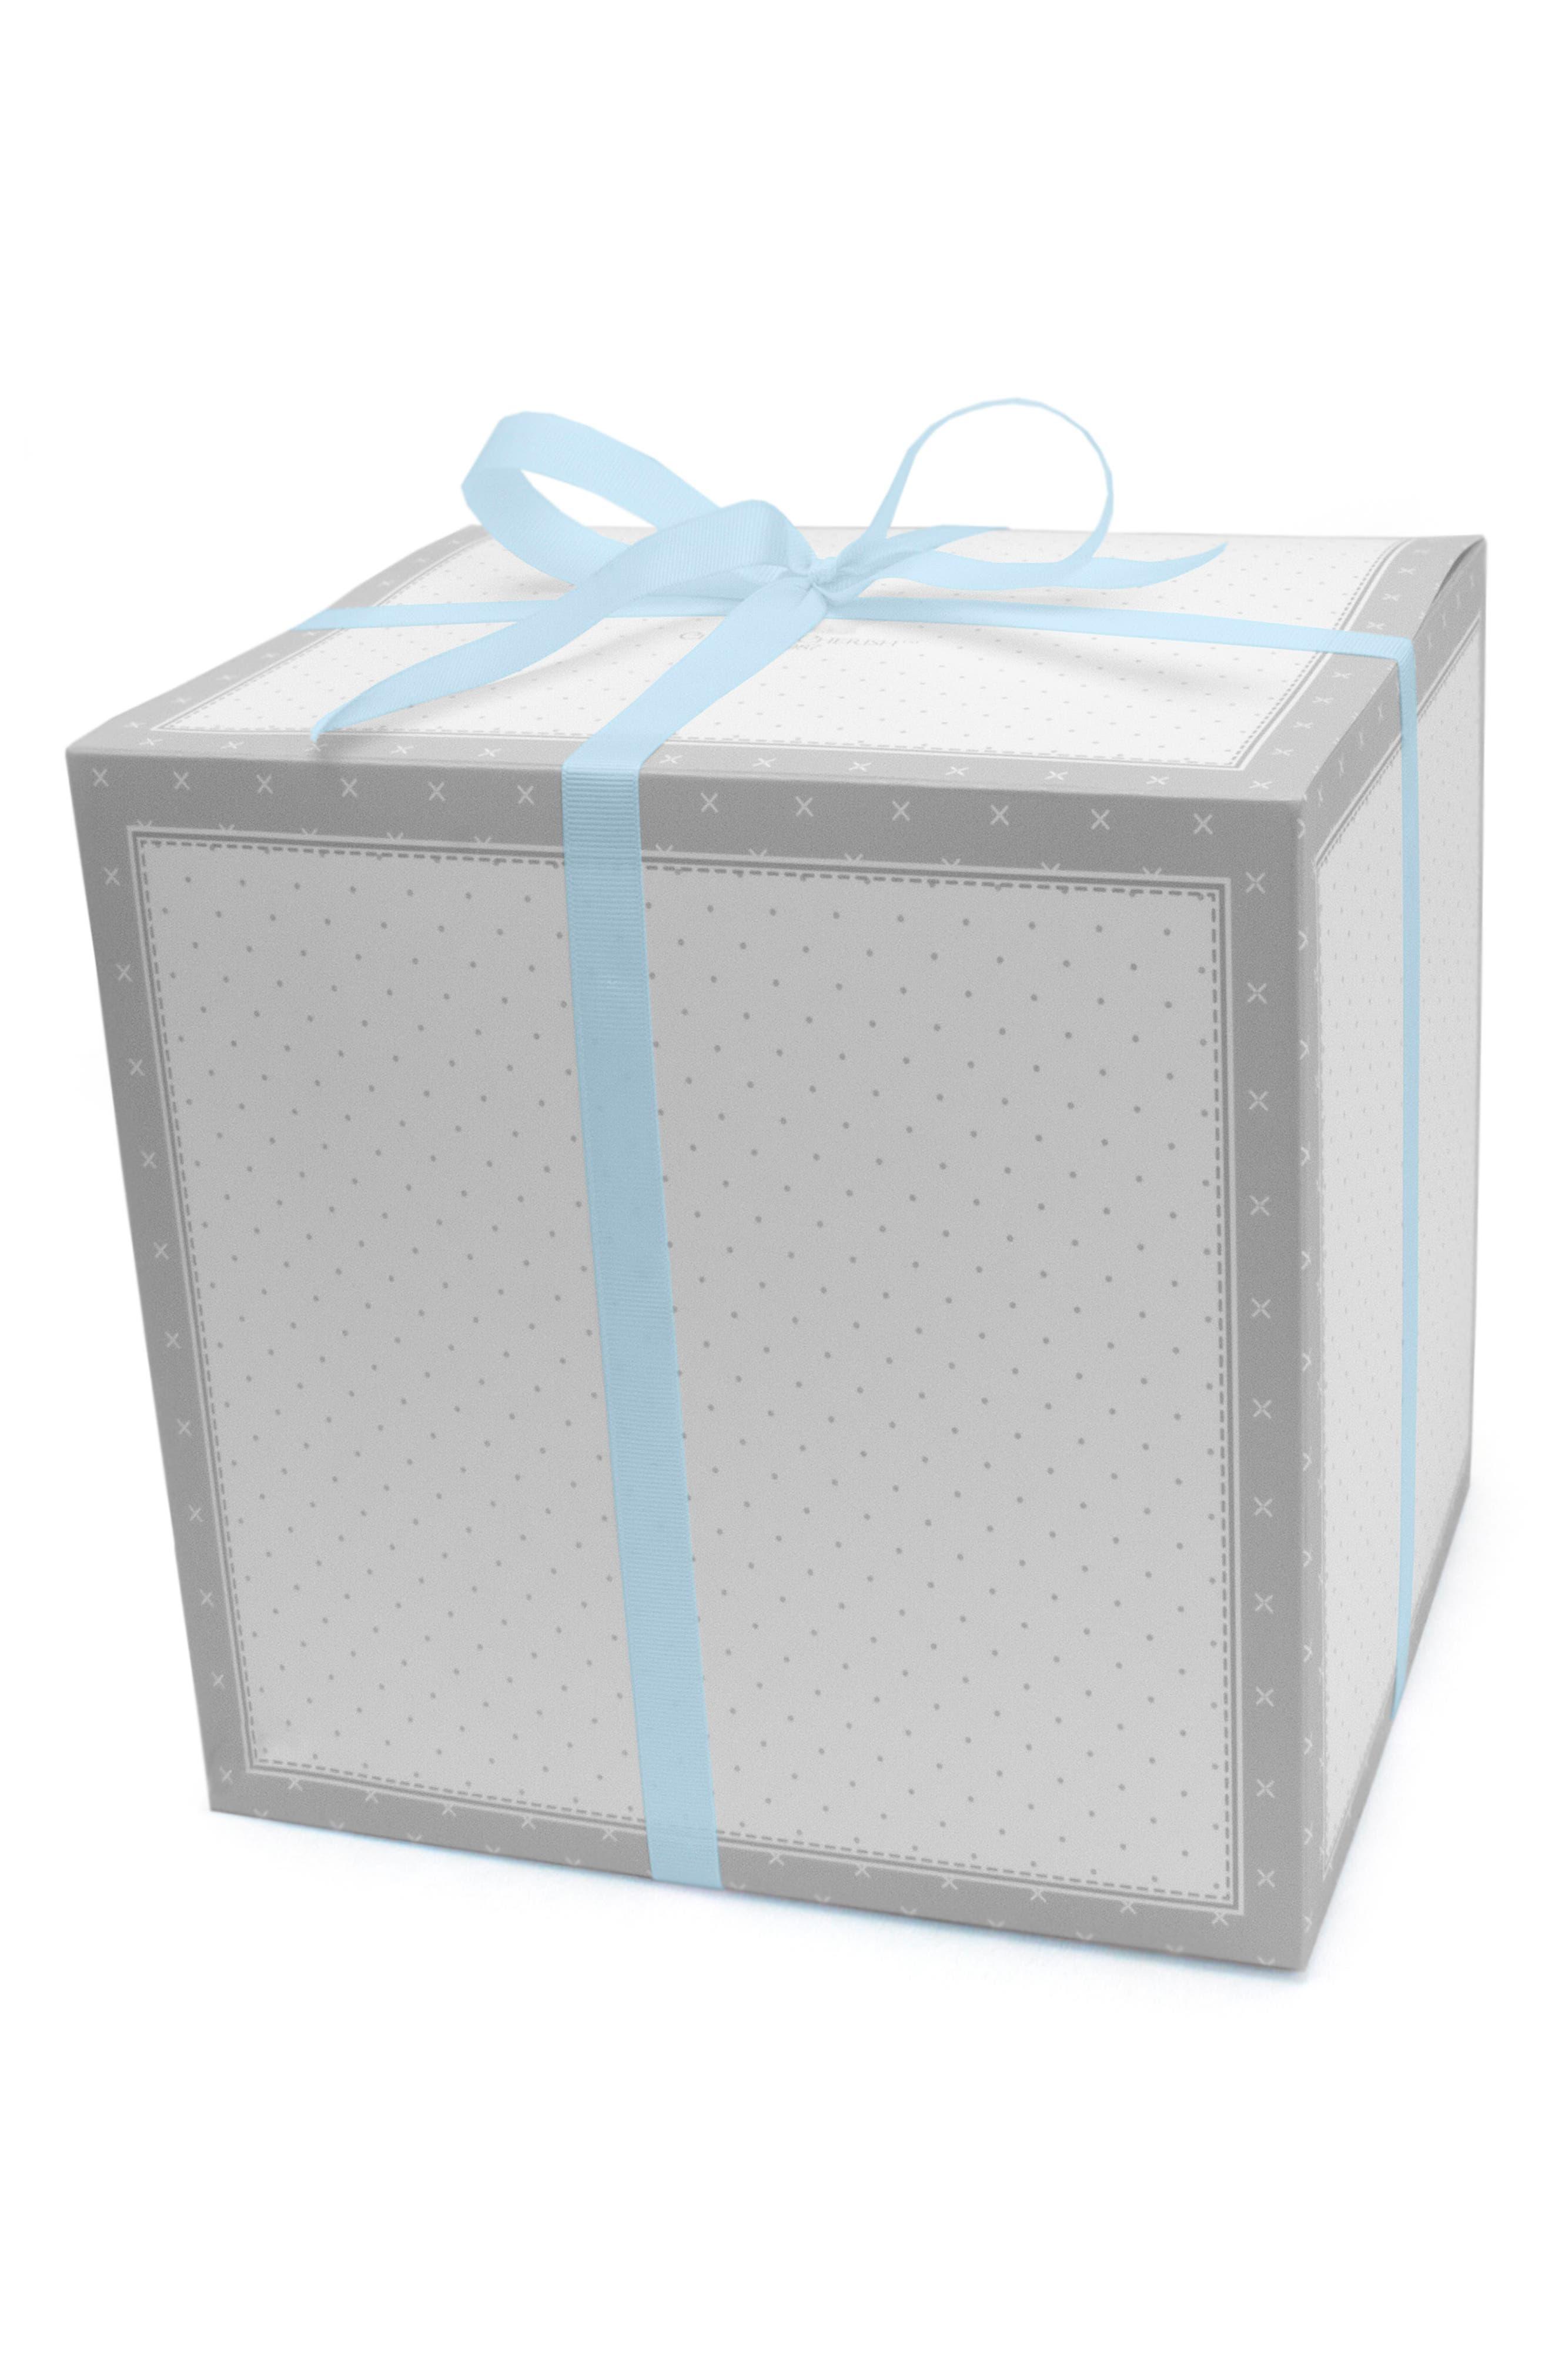 Bubbles & Whales Goldilocks Swaddle, Handprint & Photo Block Gift Set,                             Alternate thumbnail 2, color,                             Blue Whale